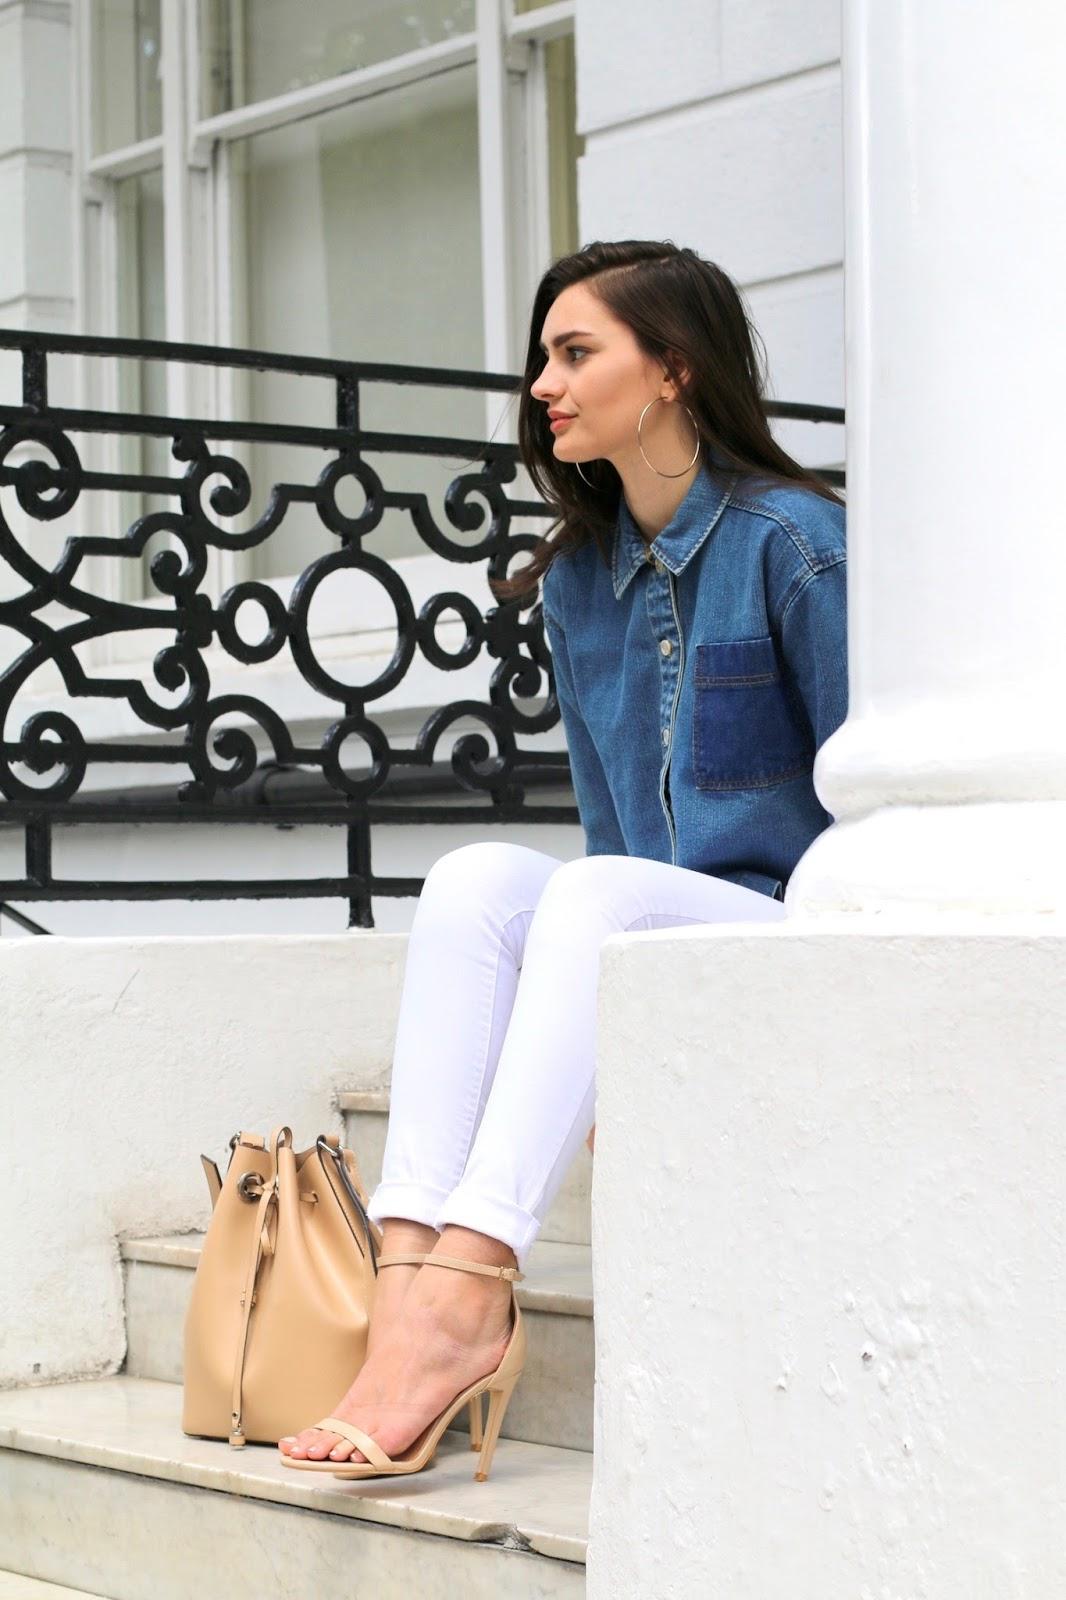 style blogger peexo